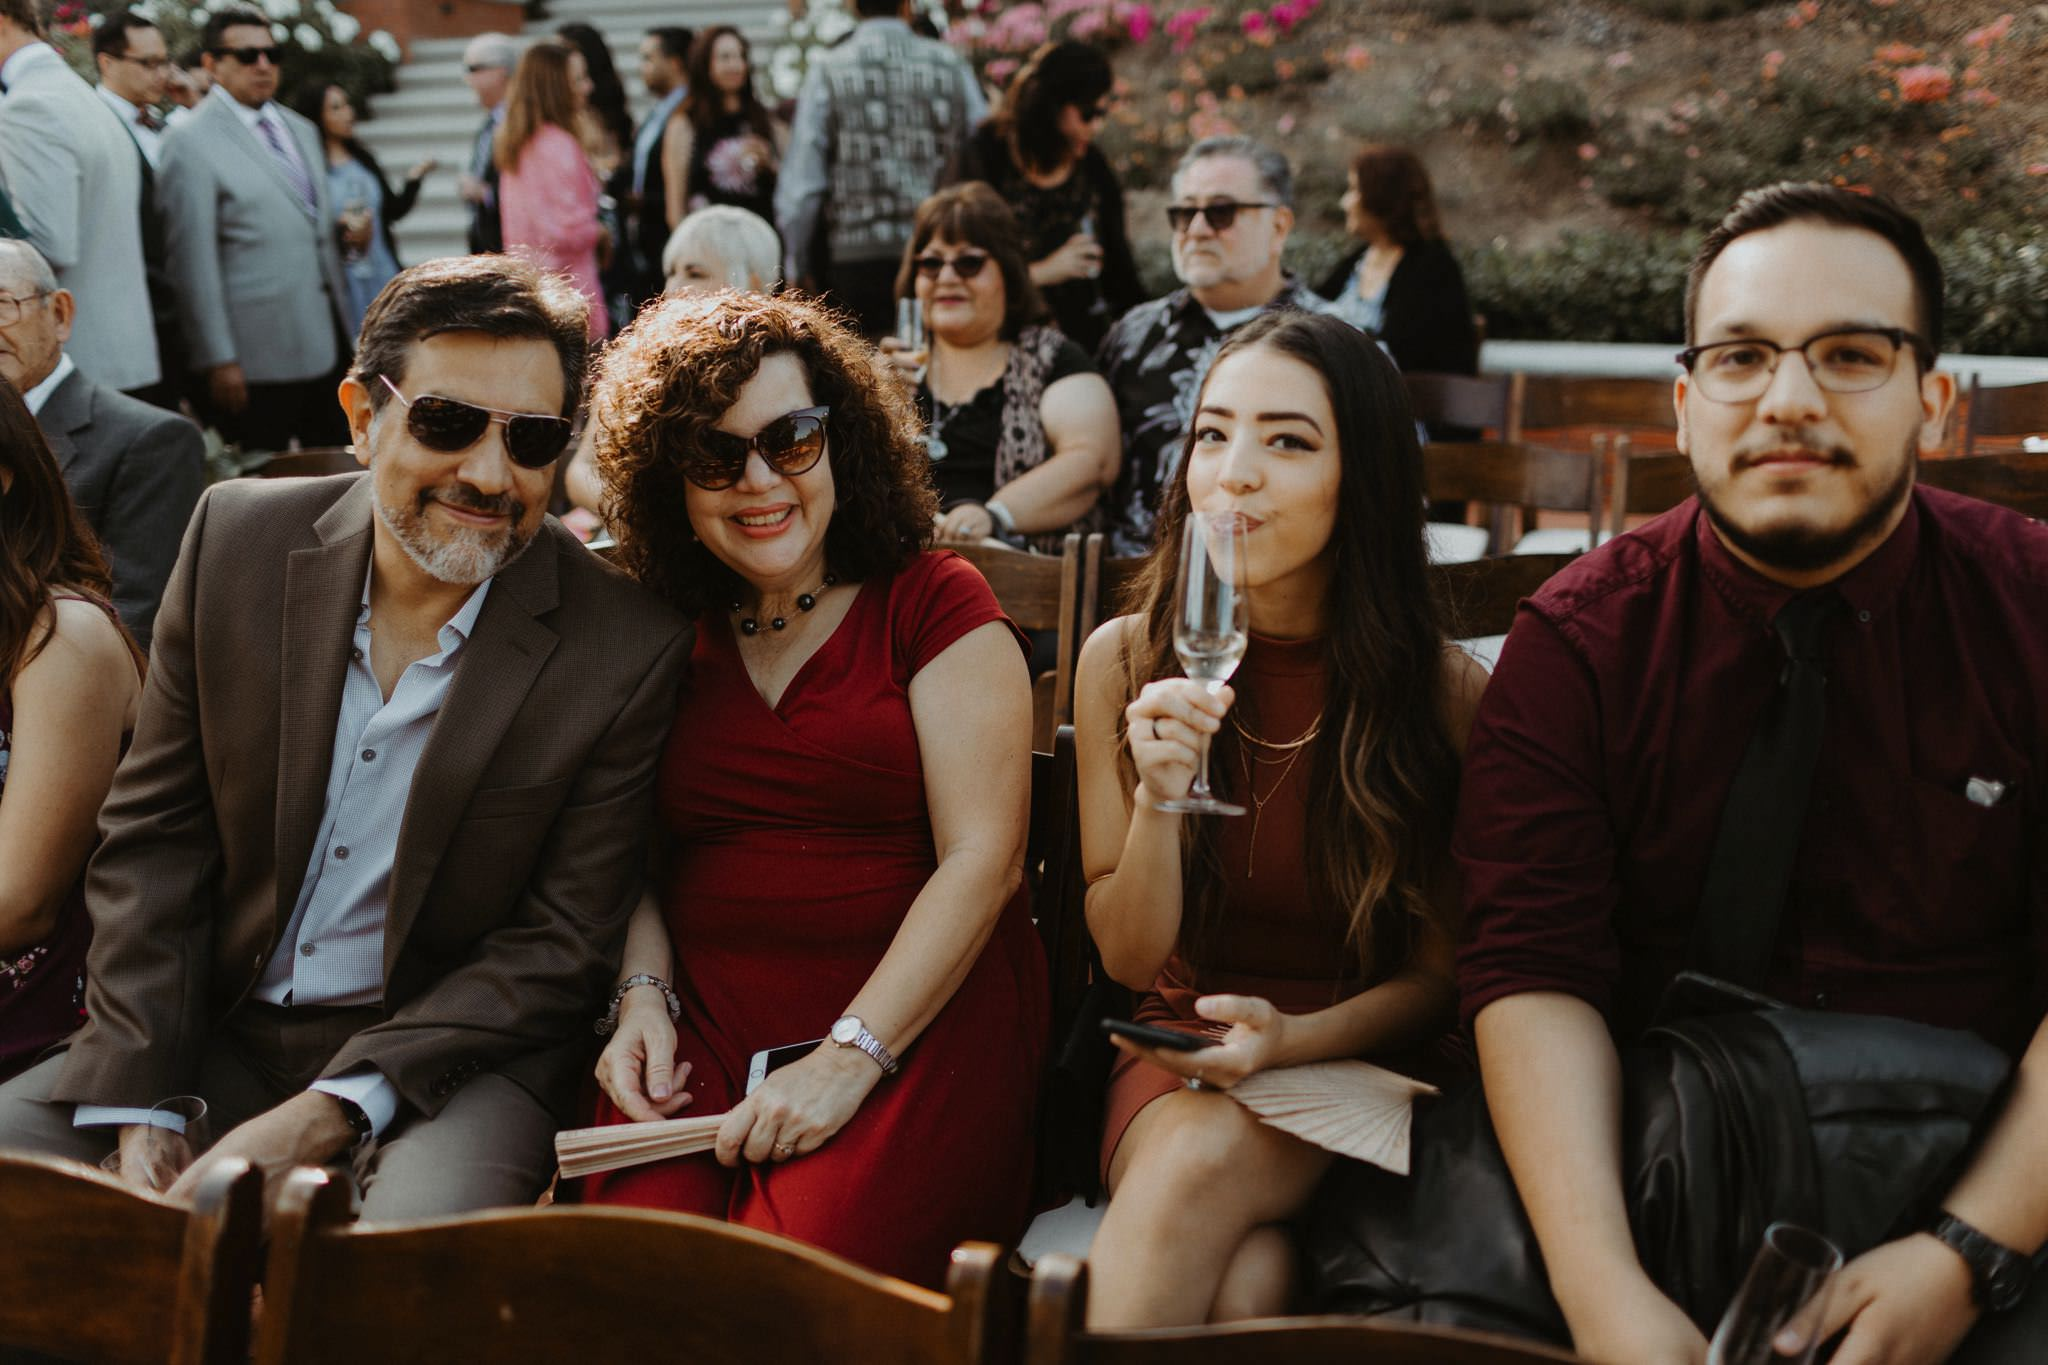 simi valley wedding photography 081